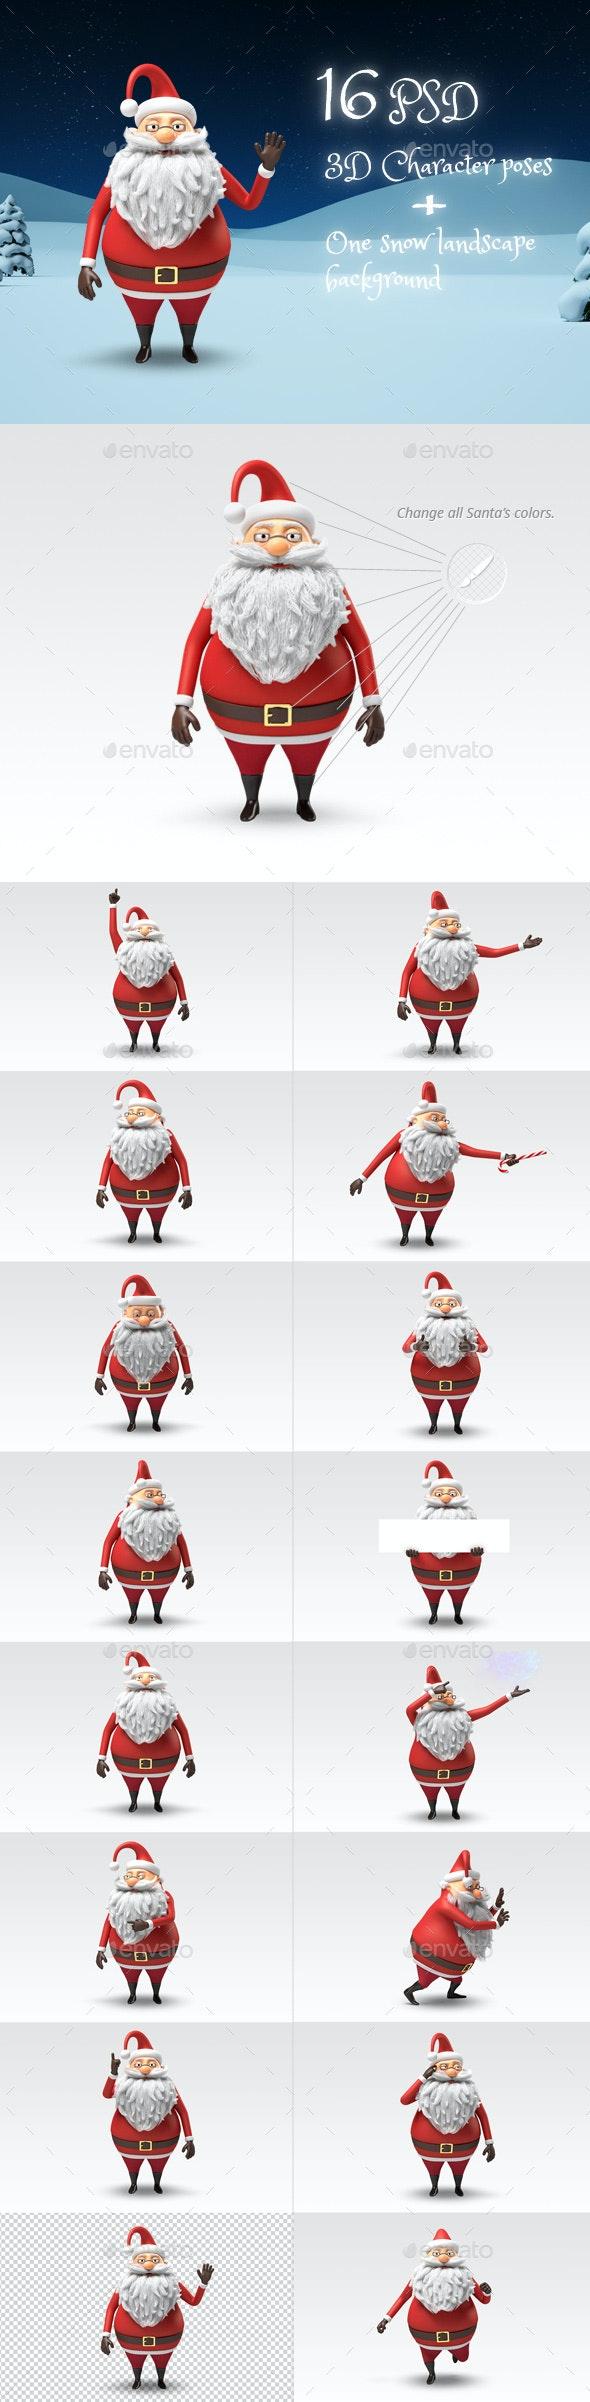 Santa - Christmas 3D Character Stills - Characters 3D Renders